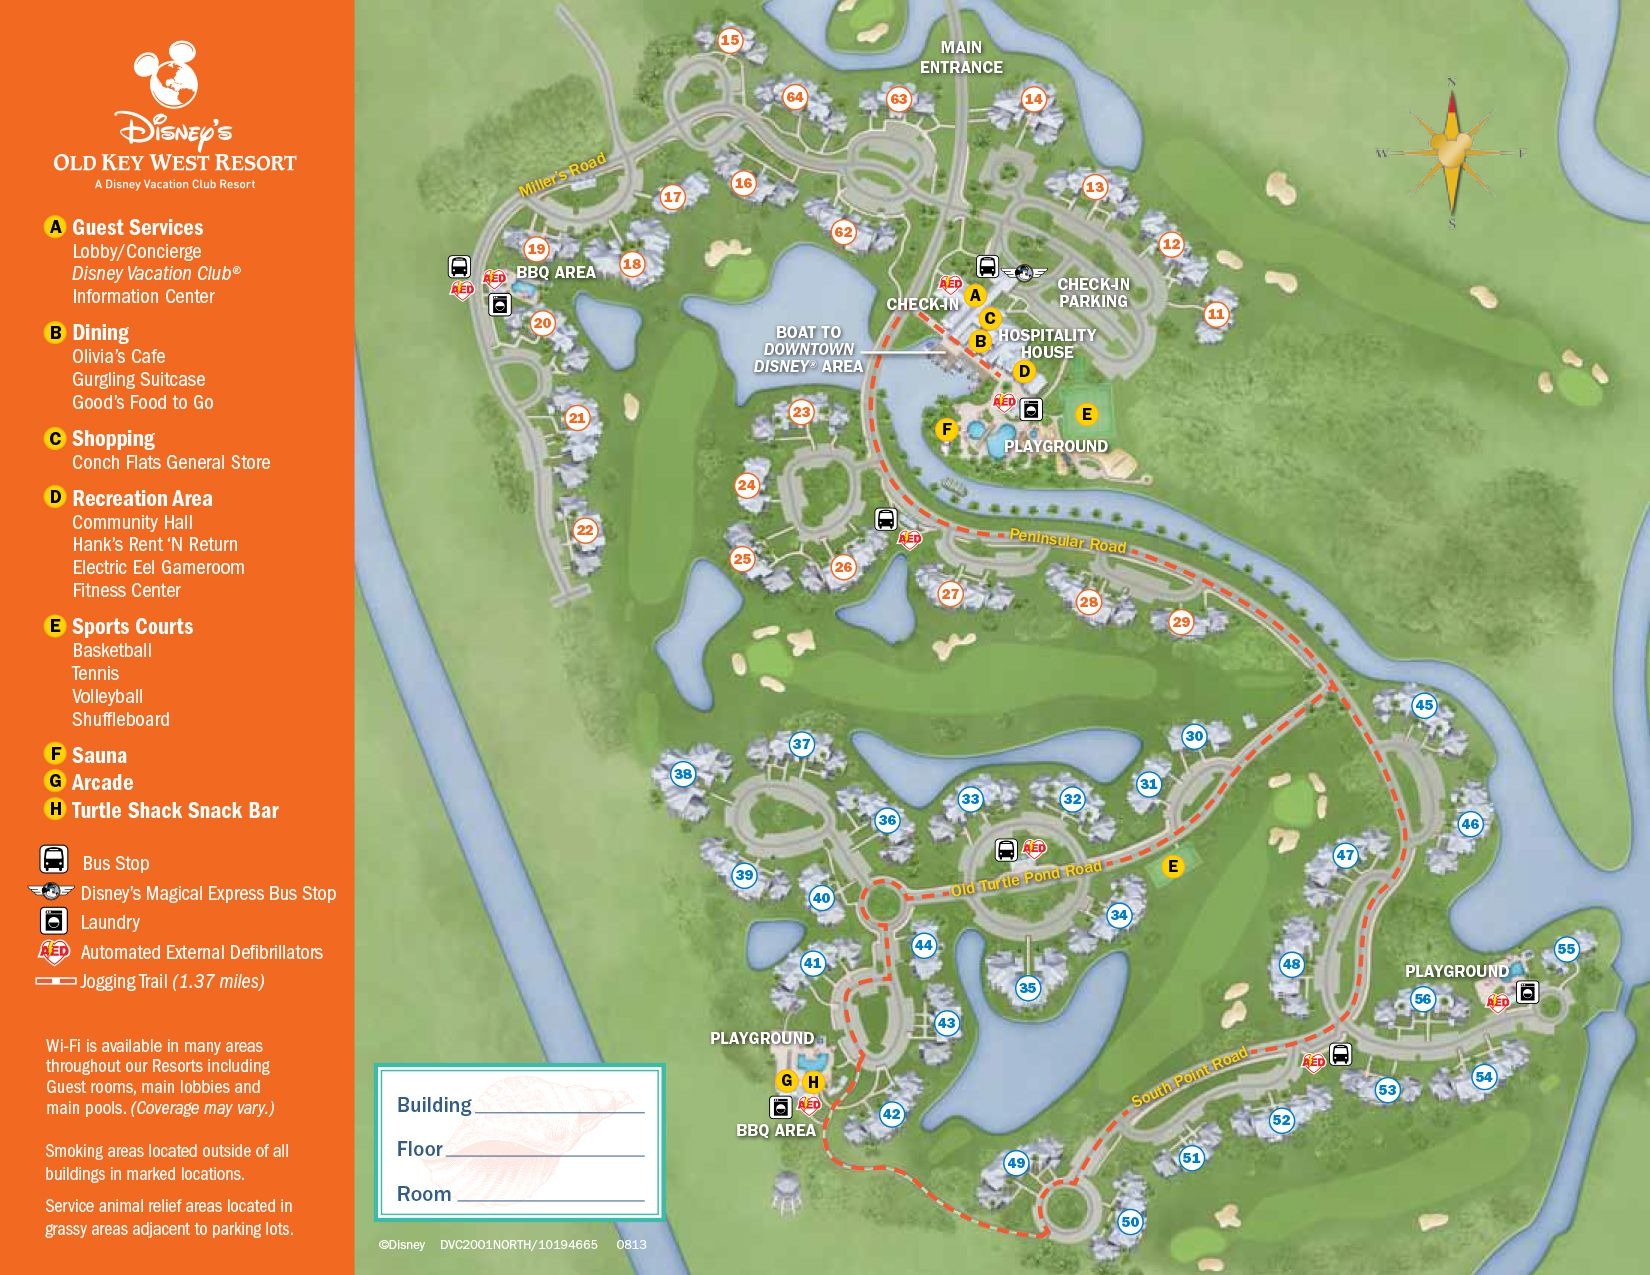 Old Key West Resort Map | Disney World Maps | Pinterest | Key west ...